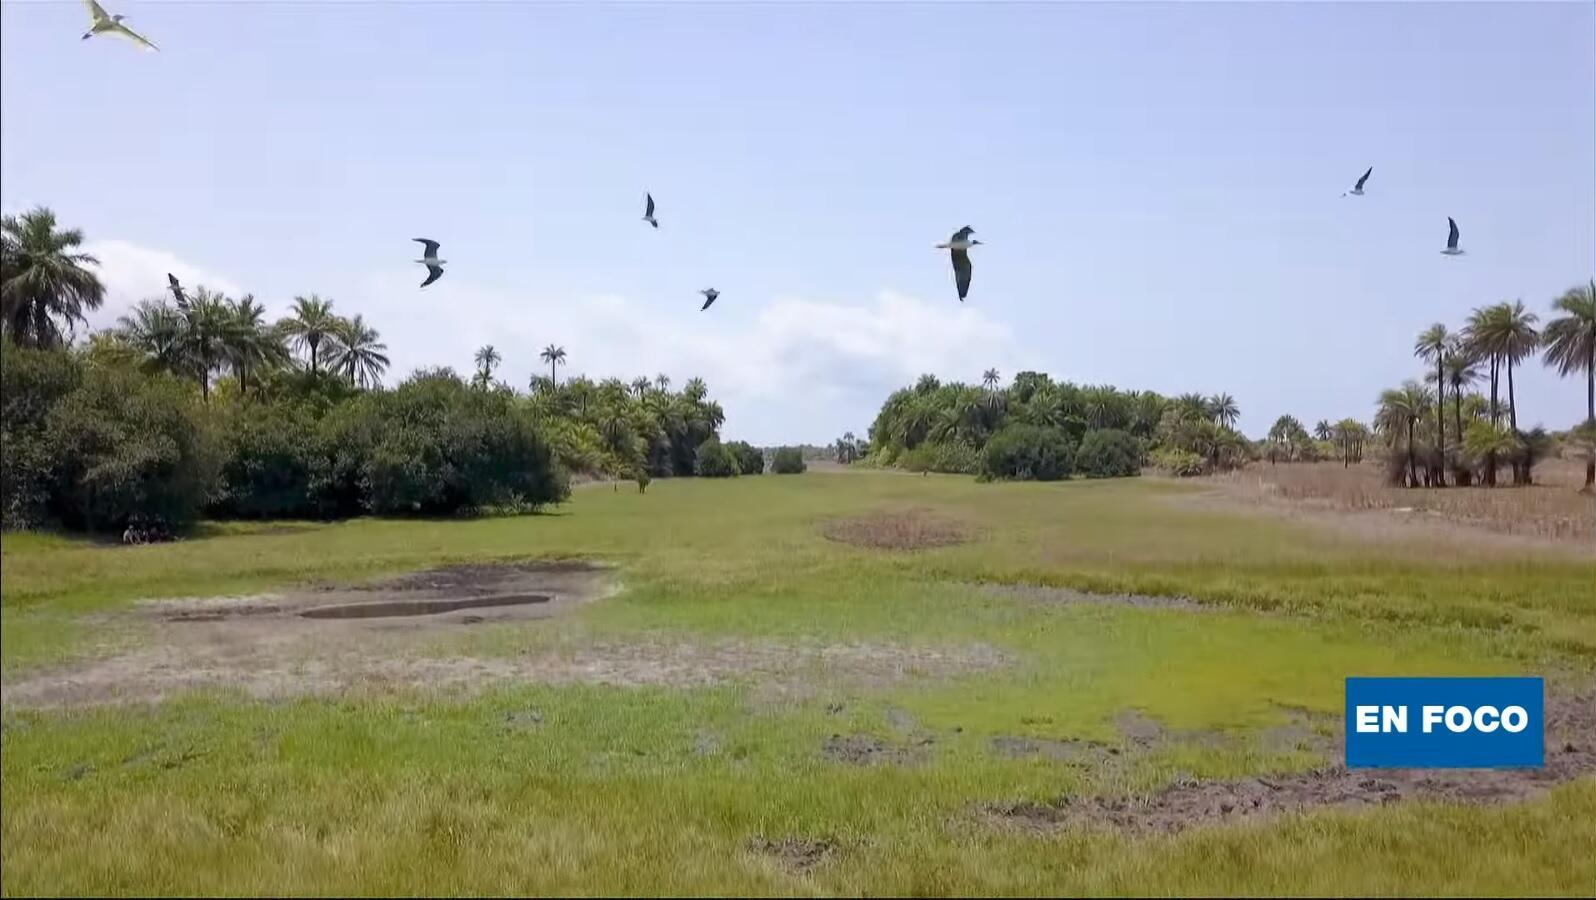 En Foco - Bijagós Guinea Bissau